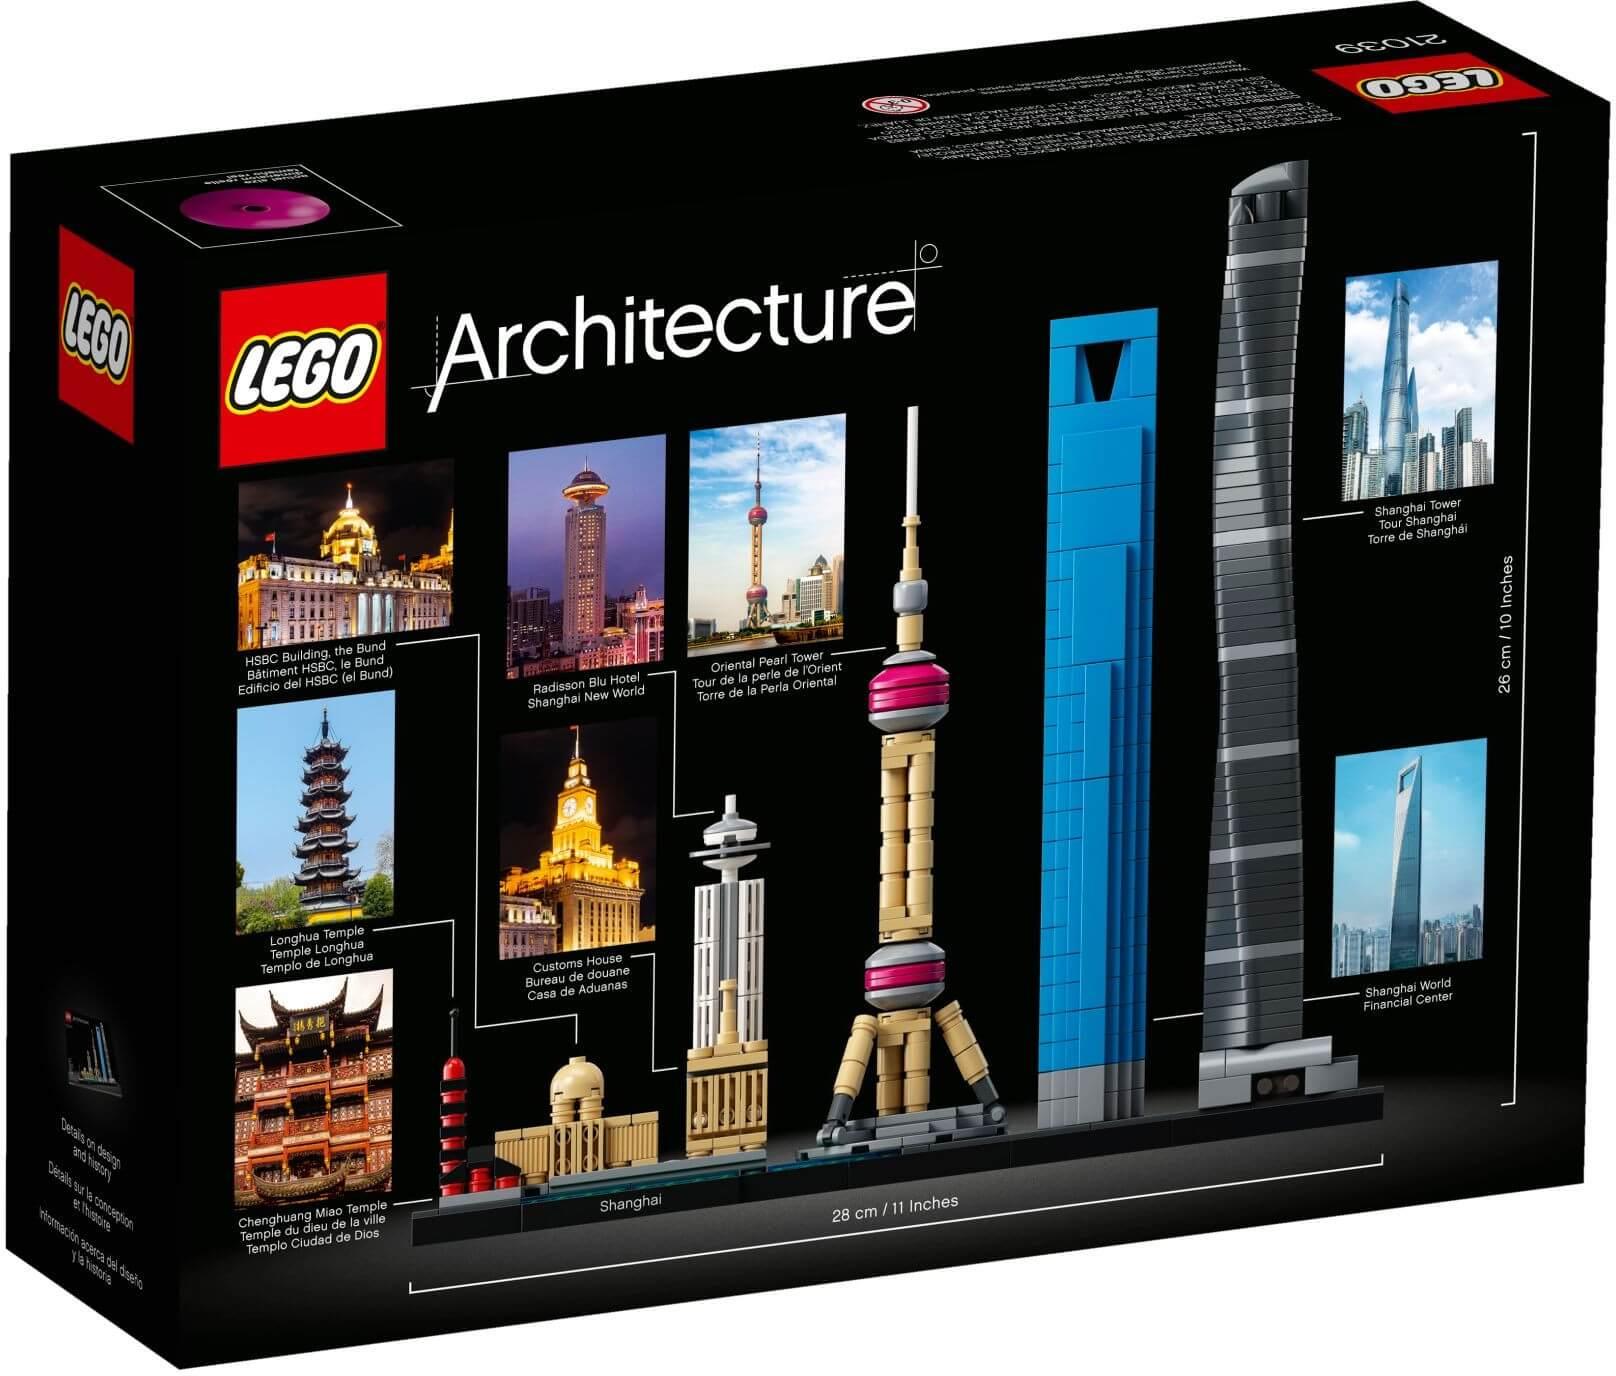 Mua đồ chơi LEGO 21039 - LEGO Architecture 21039 - Shanghai - Thượng Hải (LEGO Architecture 21039 Shanghai)